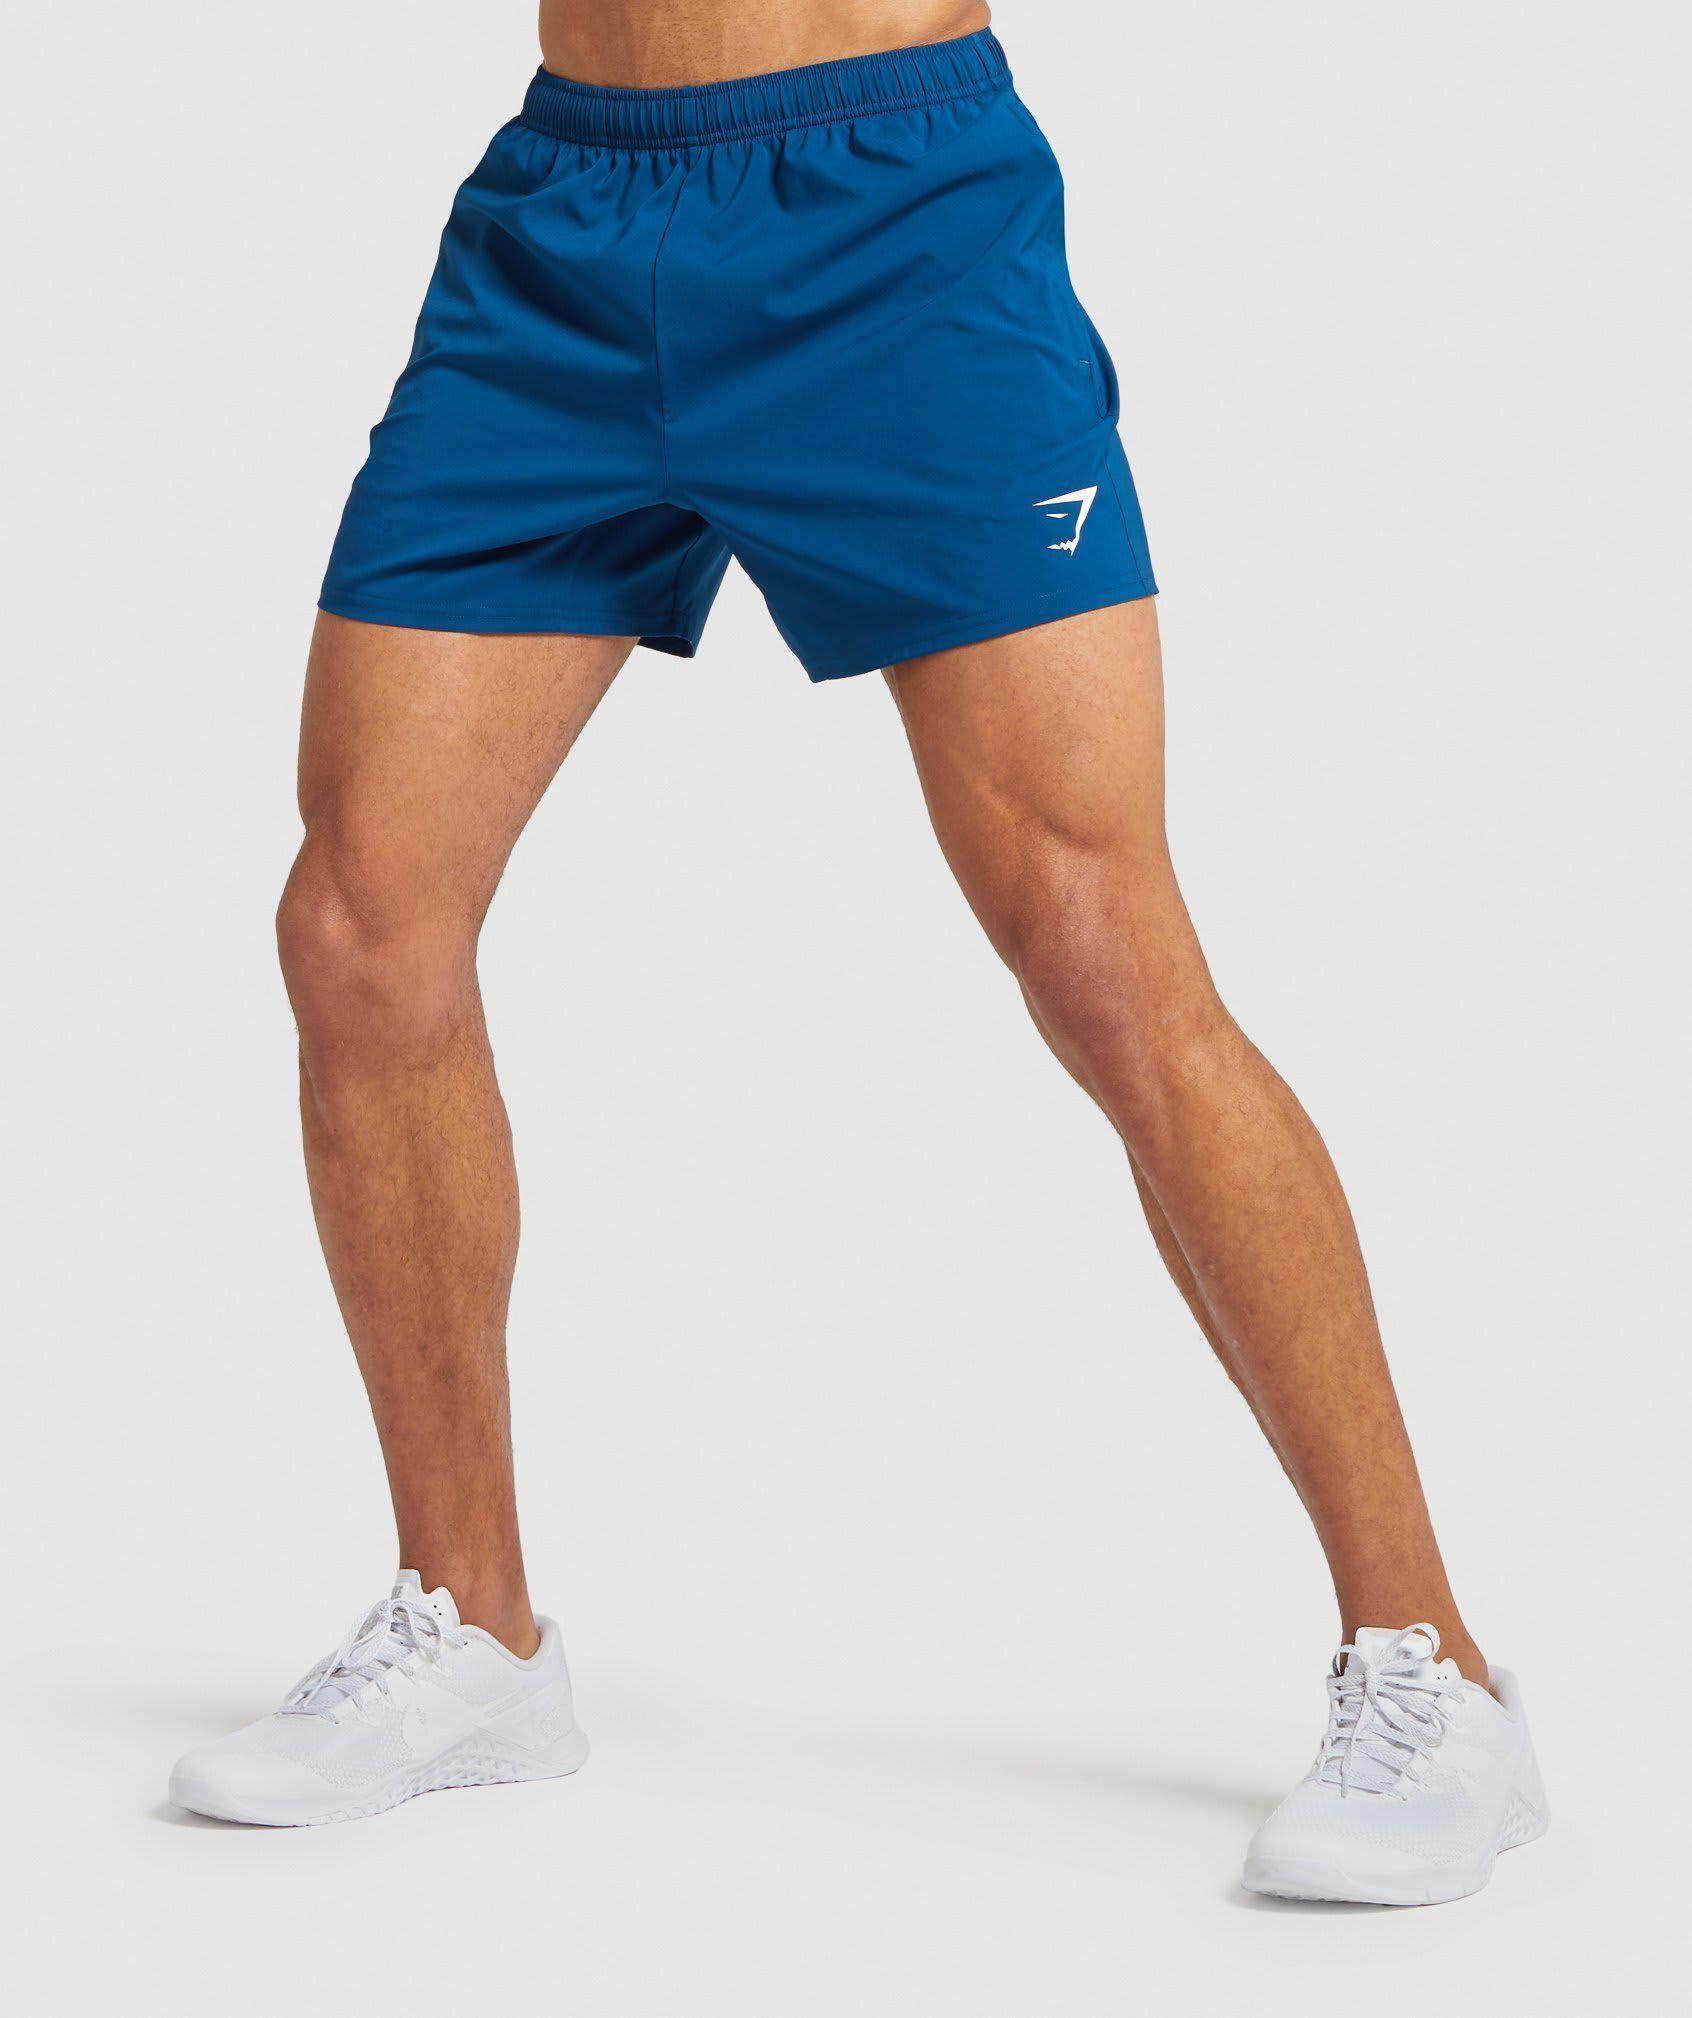 Gymshark arrival 5 in 2020 gym outfit men mens shorts